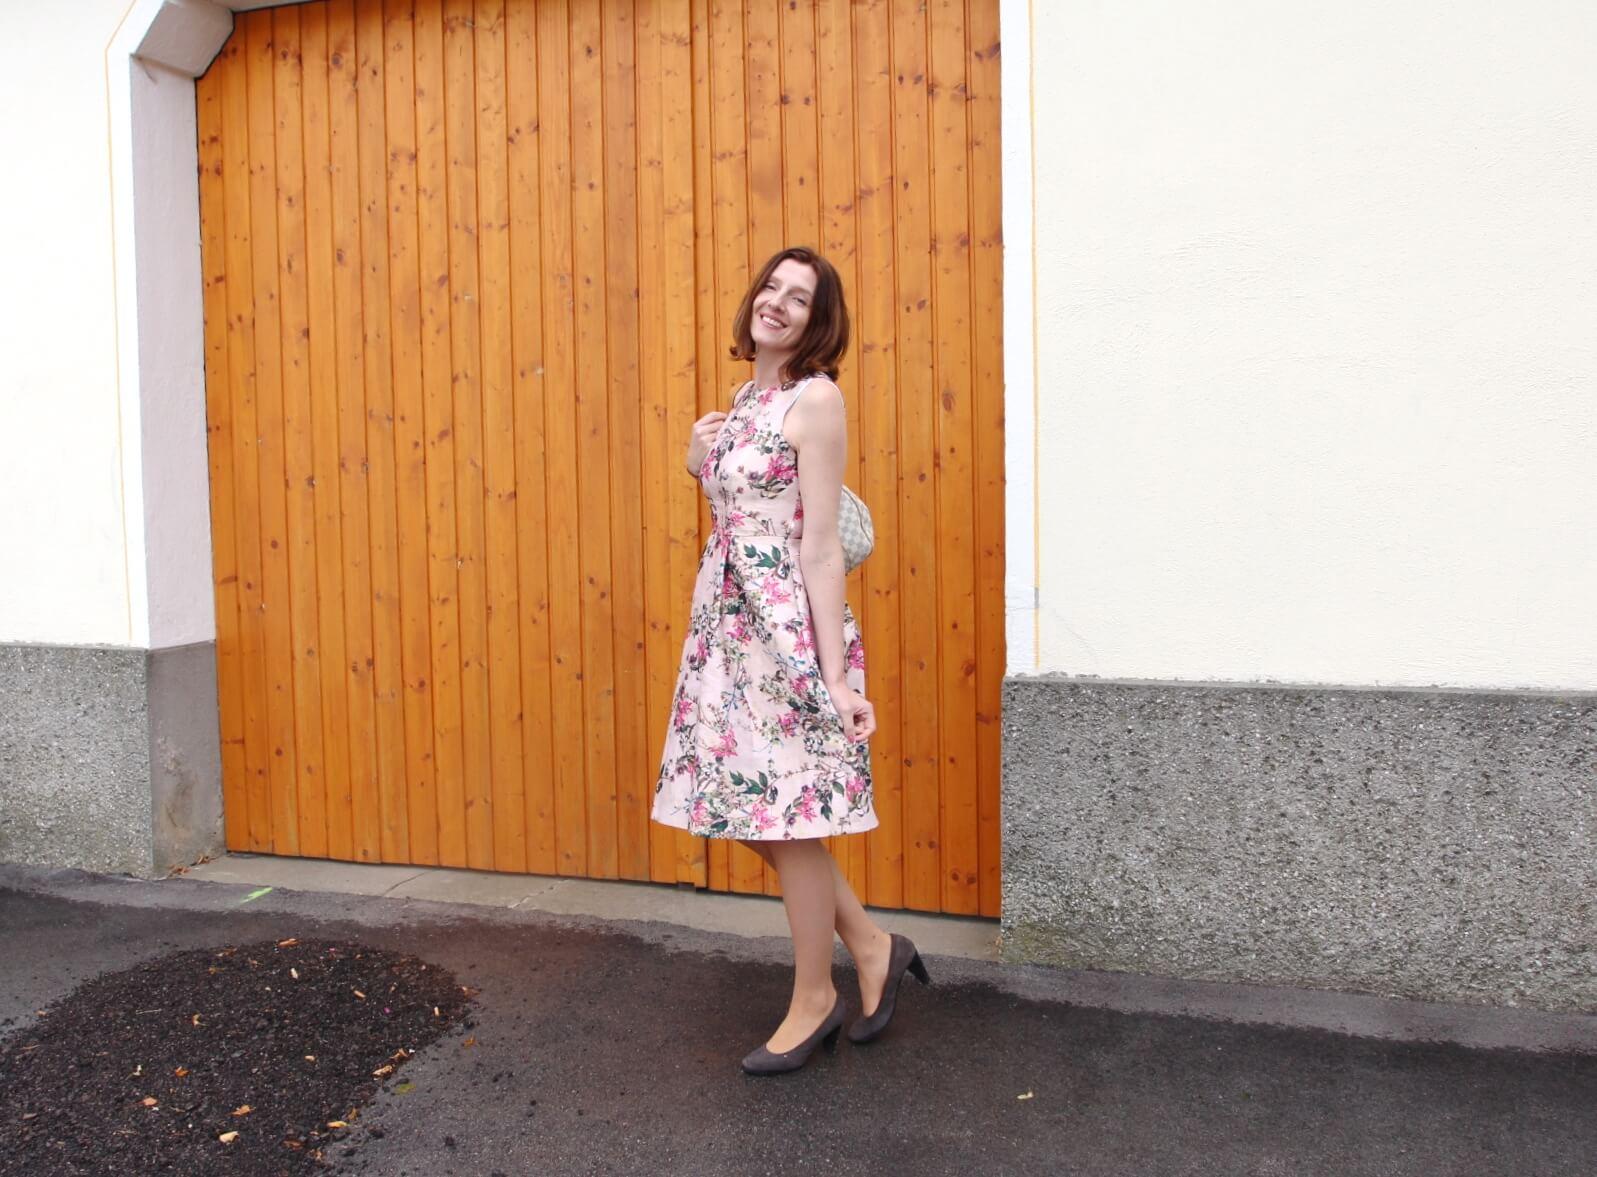 HOME OF HAPPY DRESSCODE FR HOCHZEITSGSTE WHAT NOT TO WEAR